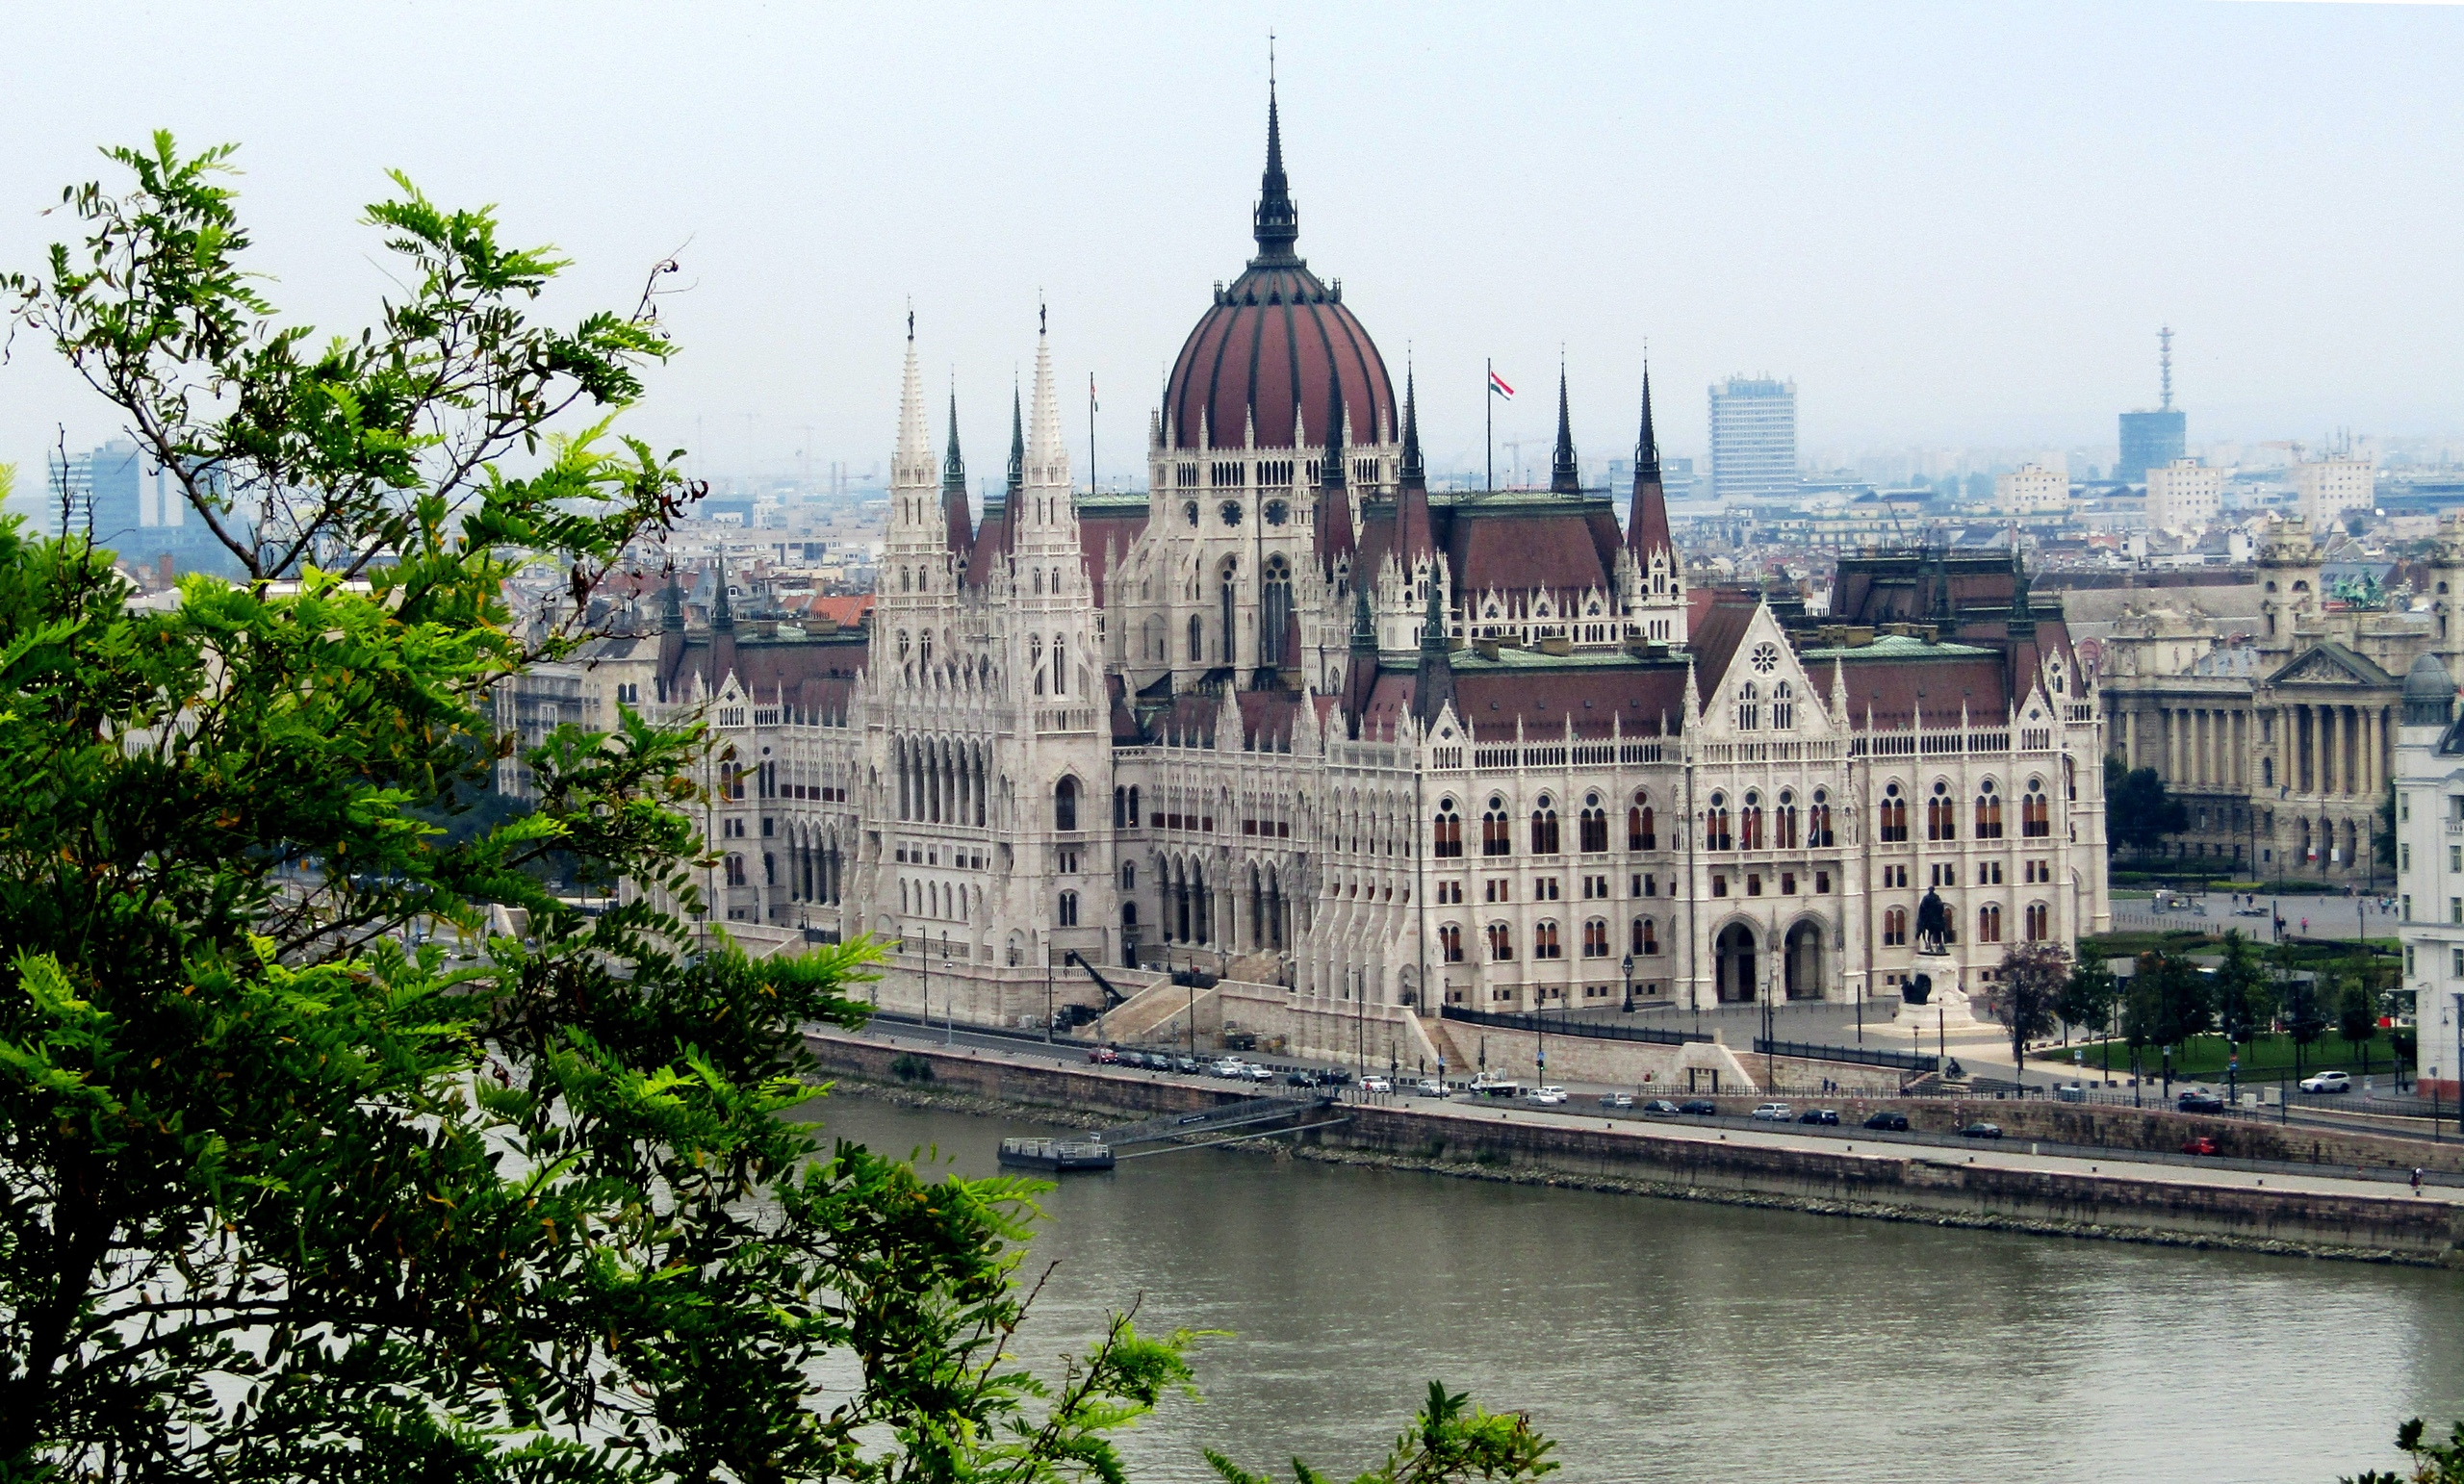 Главный символ Будапешта. Здание парламента.